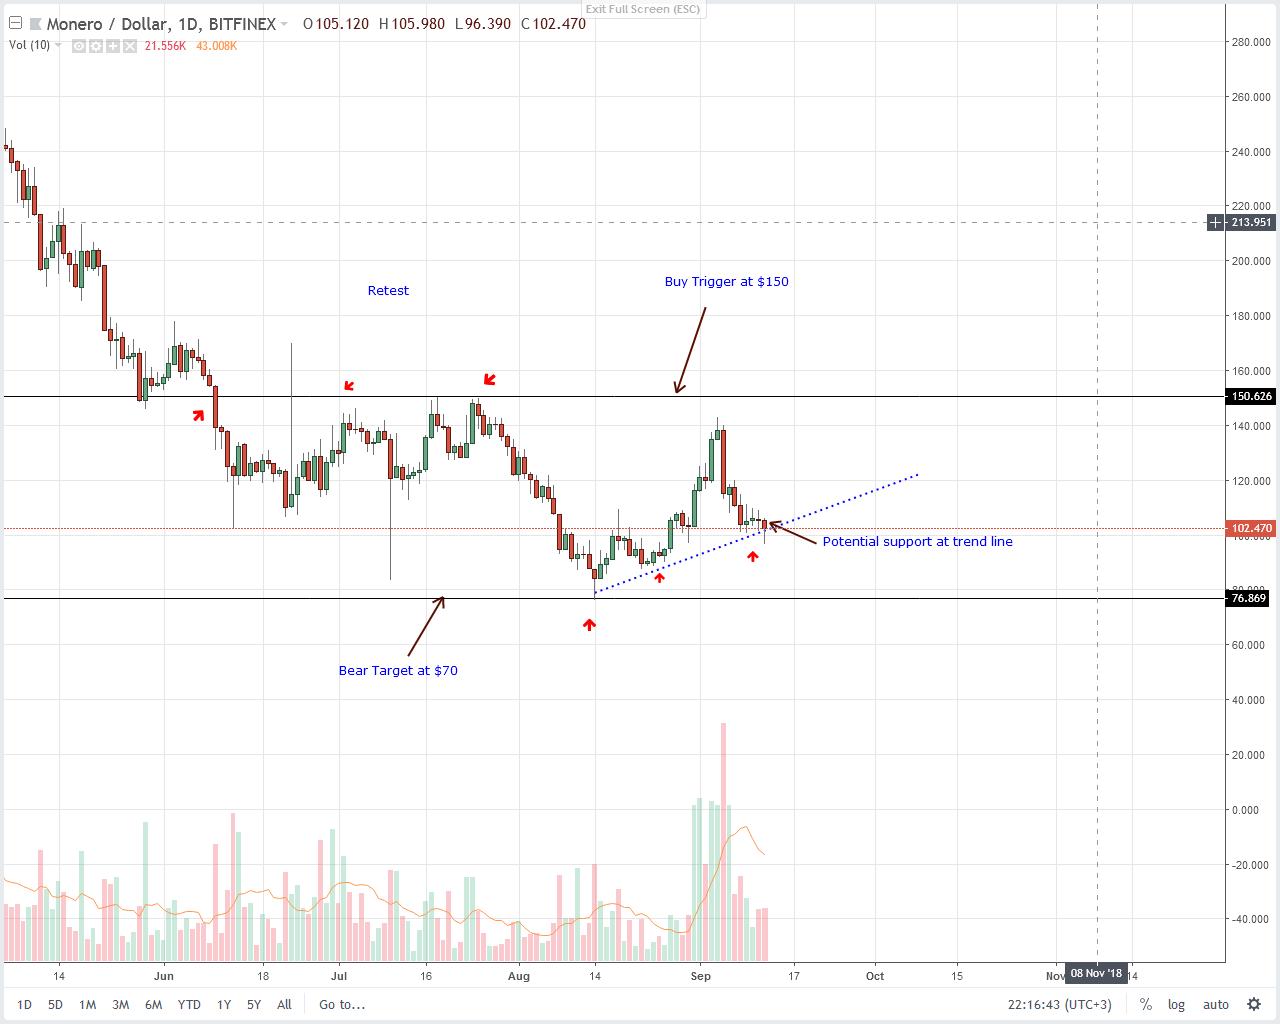 Monero (XMR) Technical Analysis